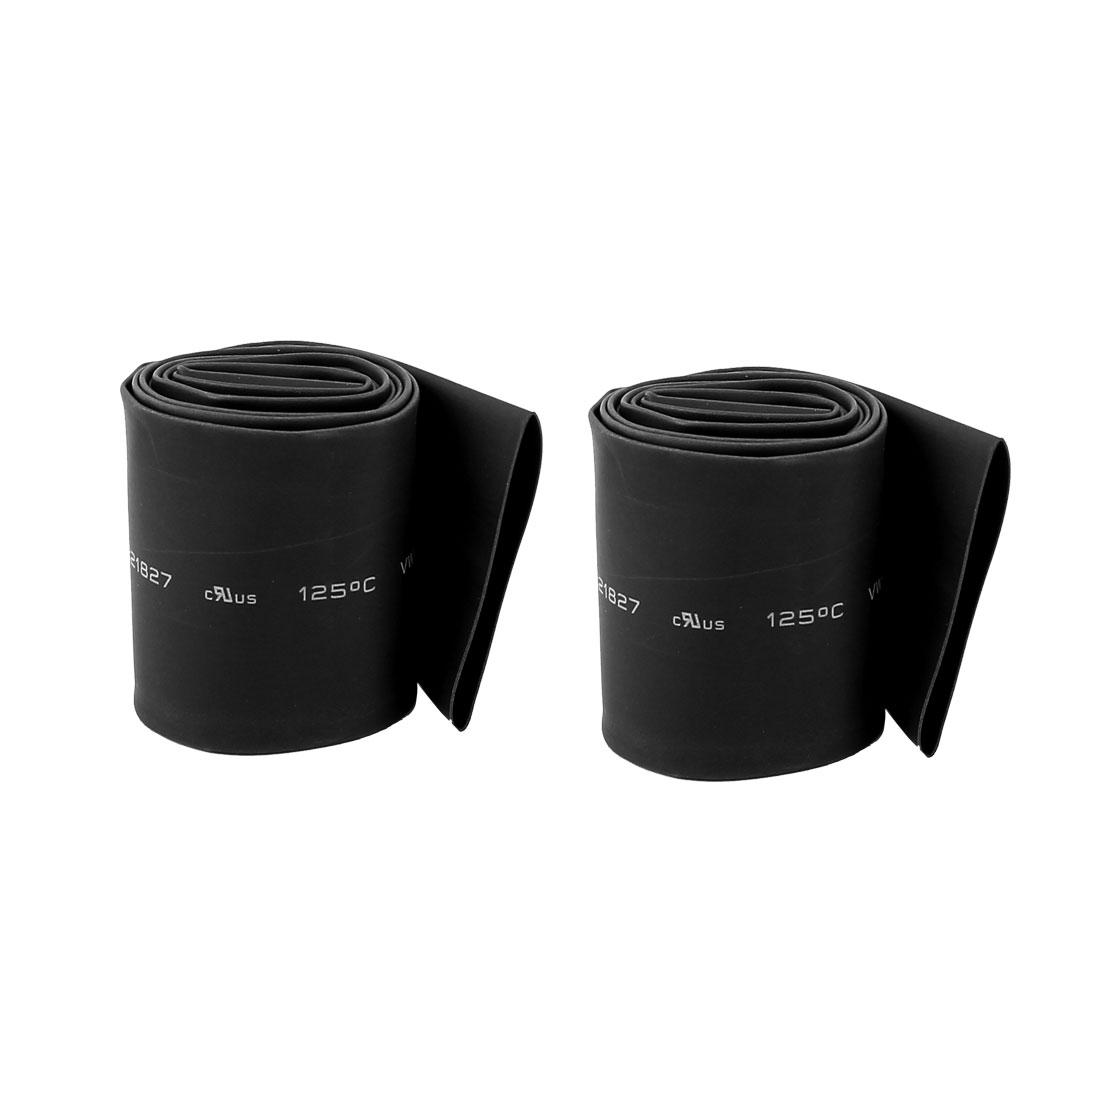 2pcs 3ft 95cm Length 35mm Dia 2:1 Black Polyolefin Insulated Heat Shrink Tubing Shrinkable Tube Wrap Sleeve